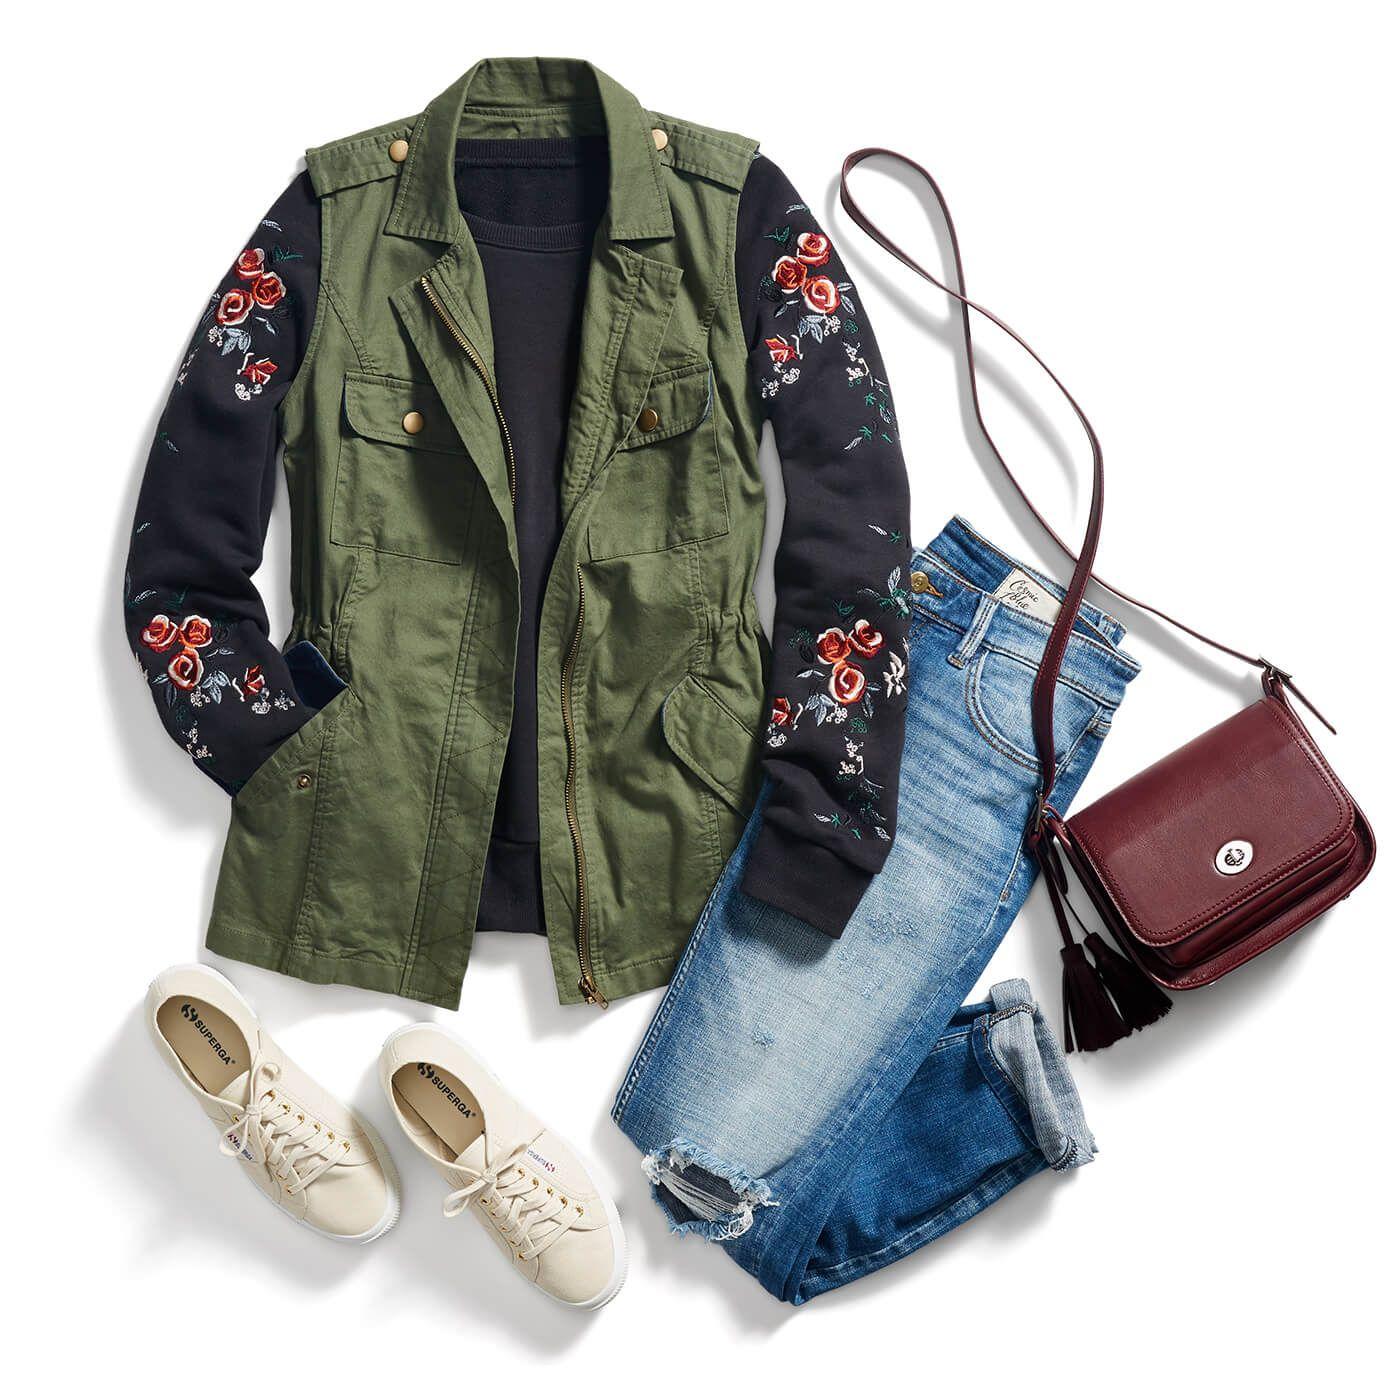 black-sweater-sweatshirt-blue-med-skinny-jeans-green-olive-vest-utility-burgundy-bag-white-shoe-sneakers-fall-winter-weekend.jpg